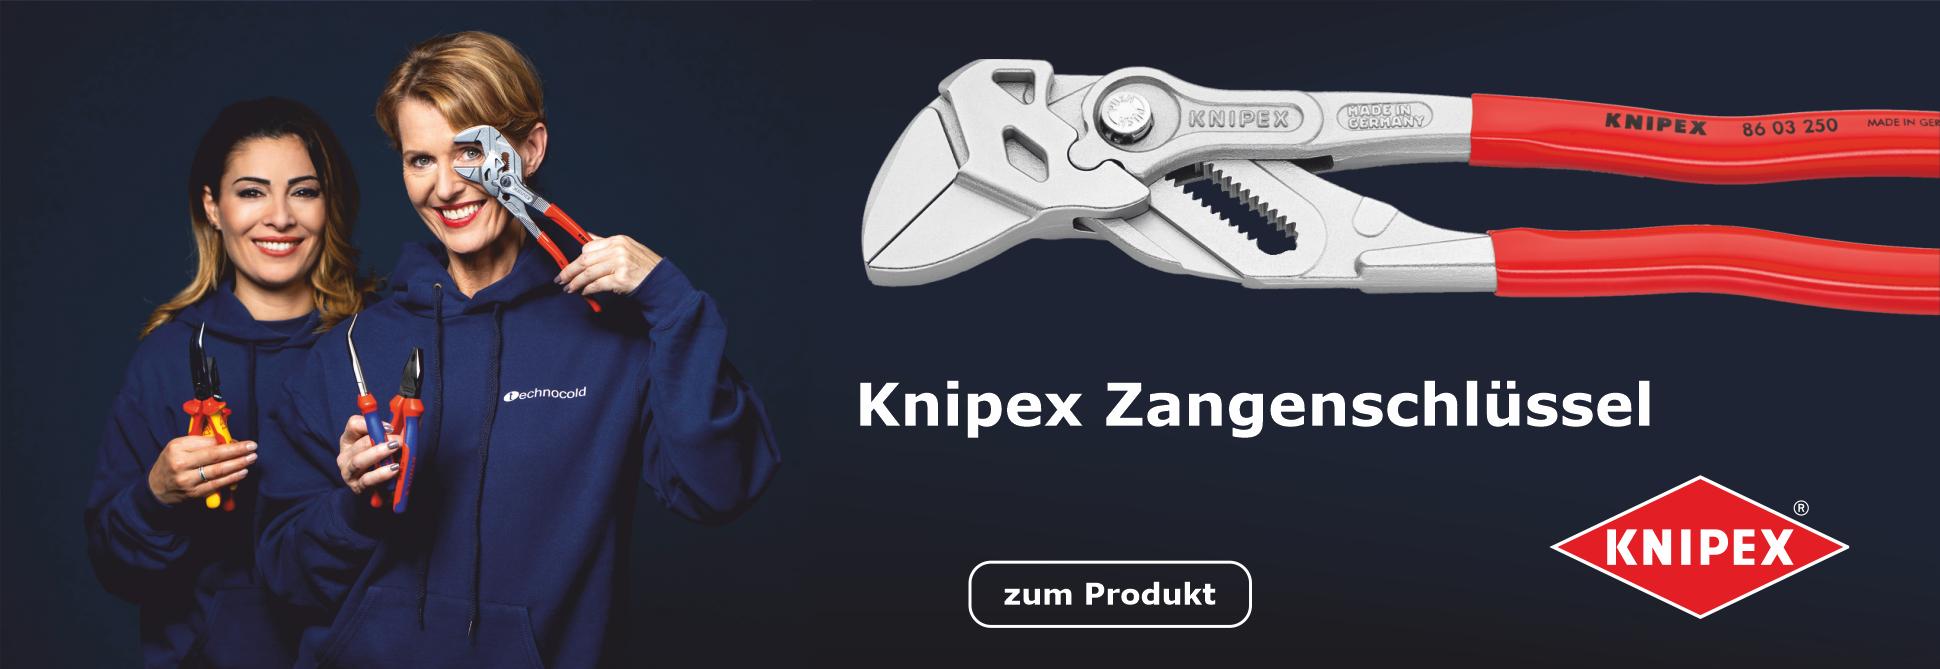 Banner Zangenschlüssel